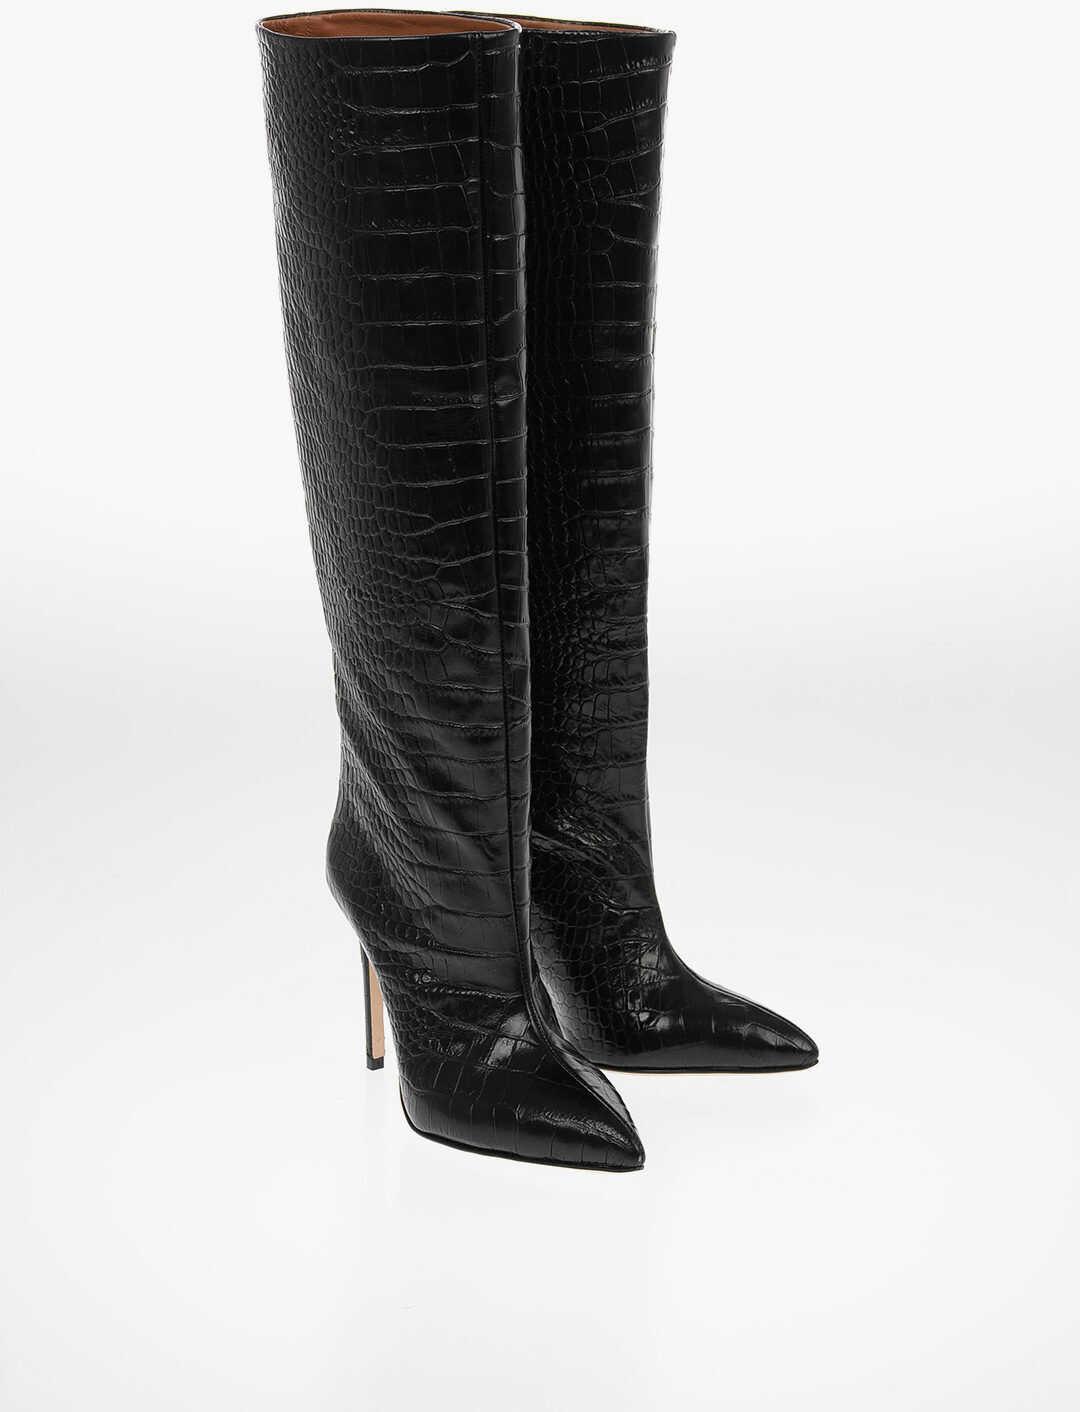 Paris Texas Croco Printed Leather Pull On Knee High Boots 10cm BLACK imagine b-mall.ro